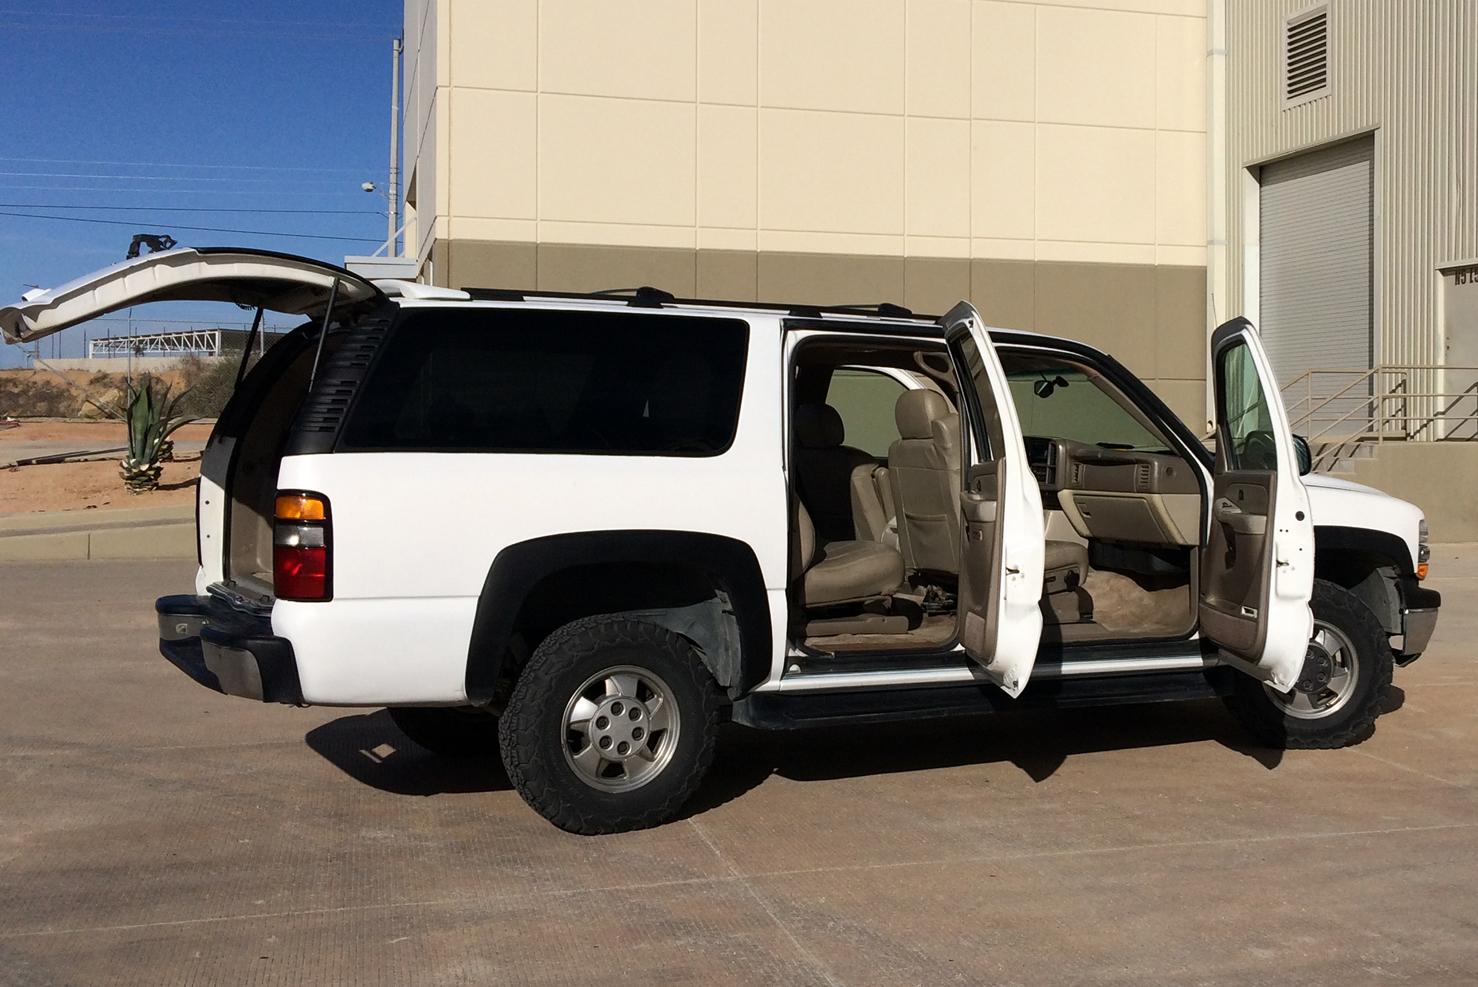 2WD Chevrolet Suburban (SUV para Actividades Recreativas) | BBB Rent A Car Los Cabos Mexico